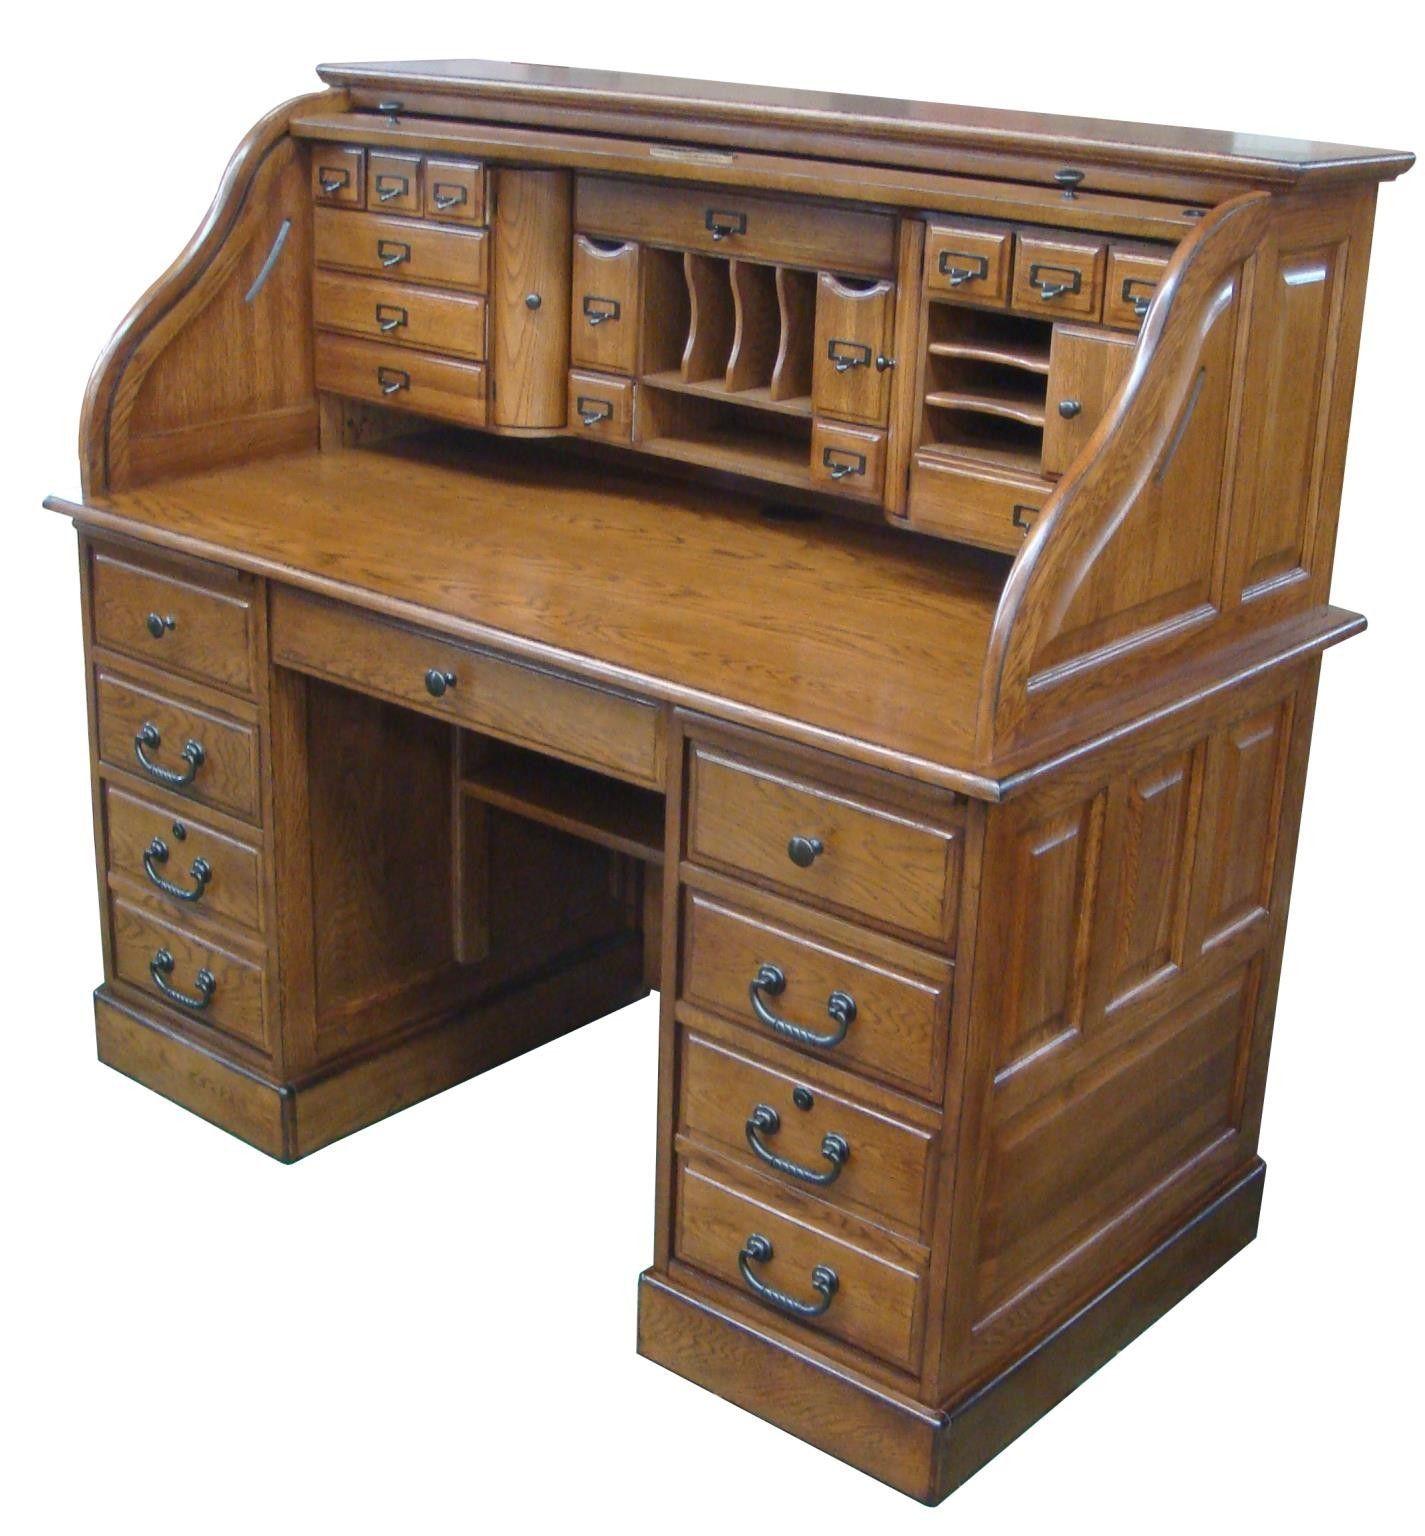 wood merchant solid product desk edge roll desks top deluxe live